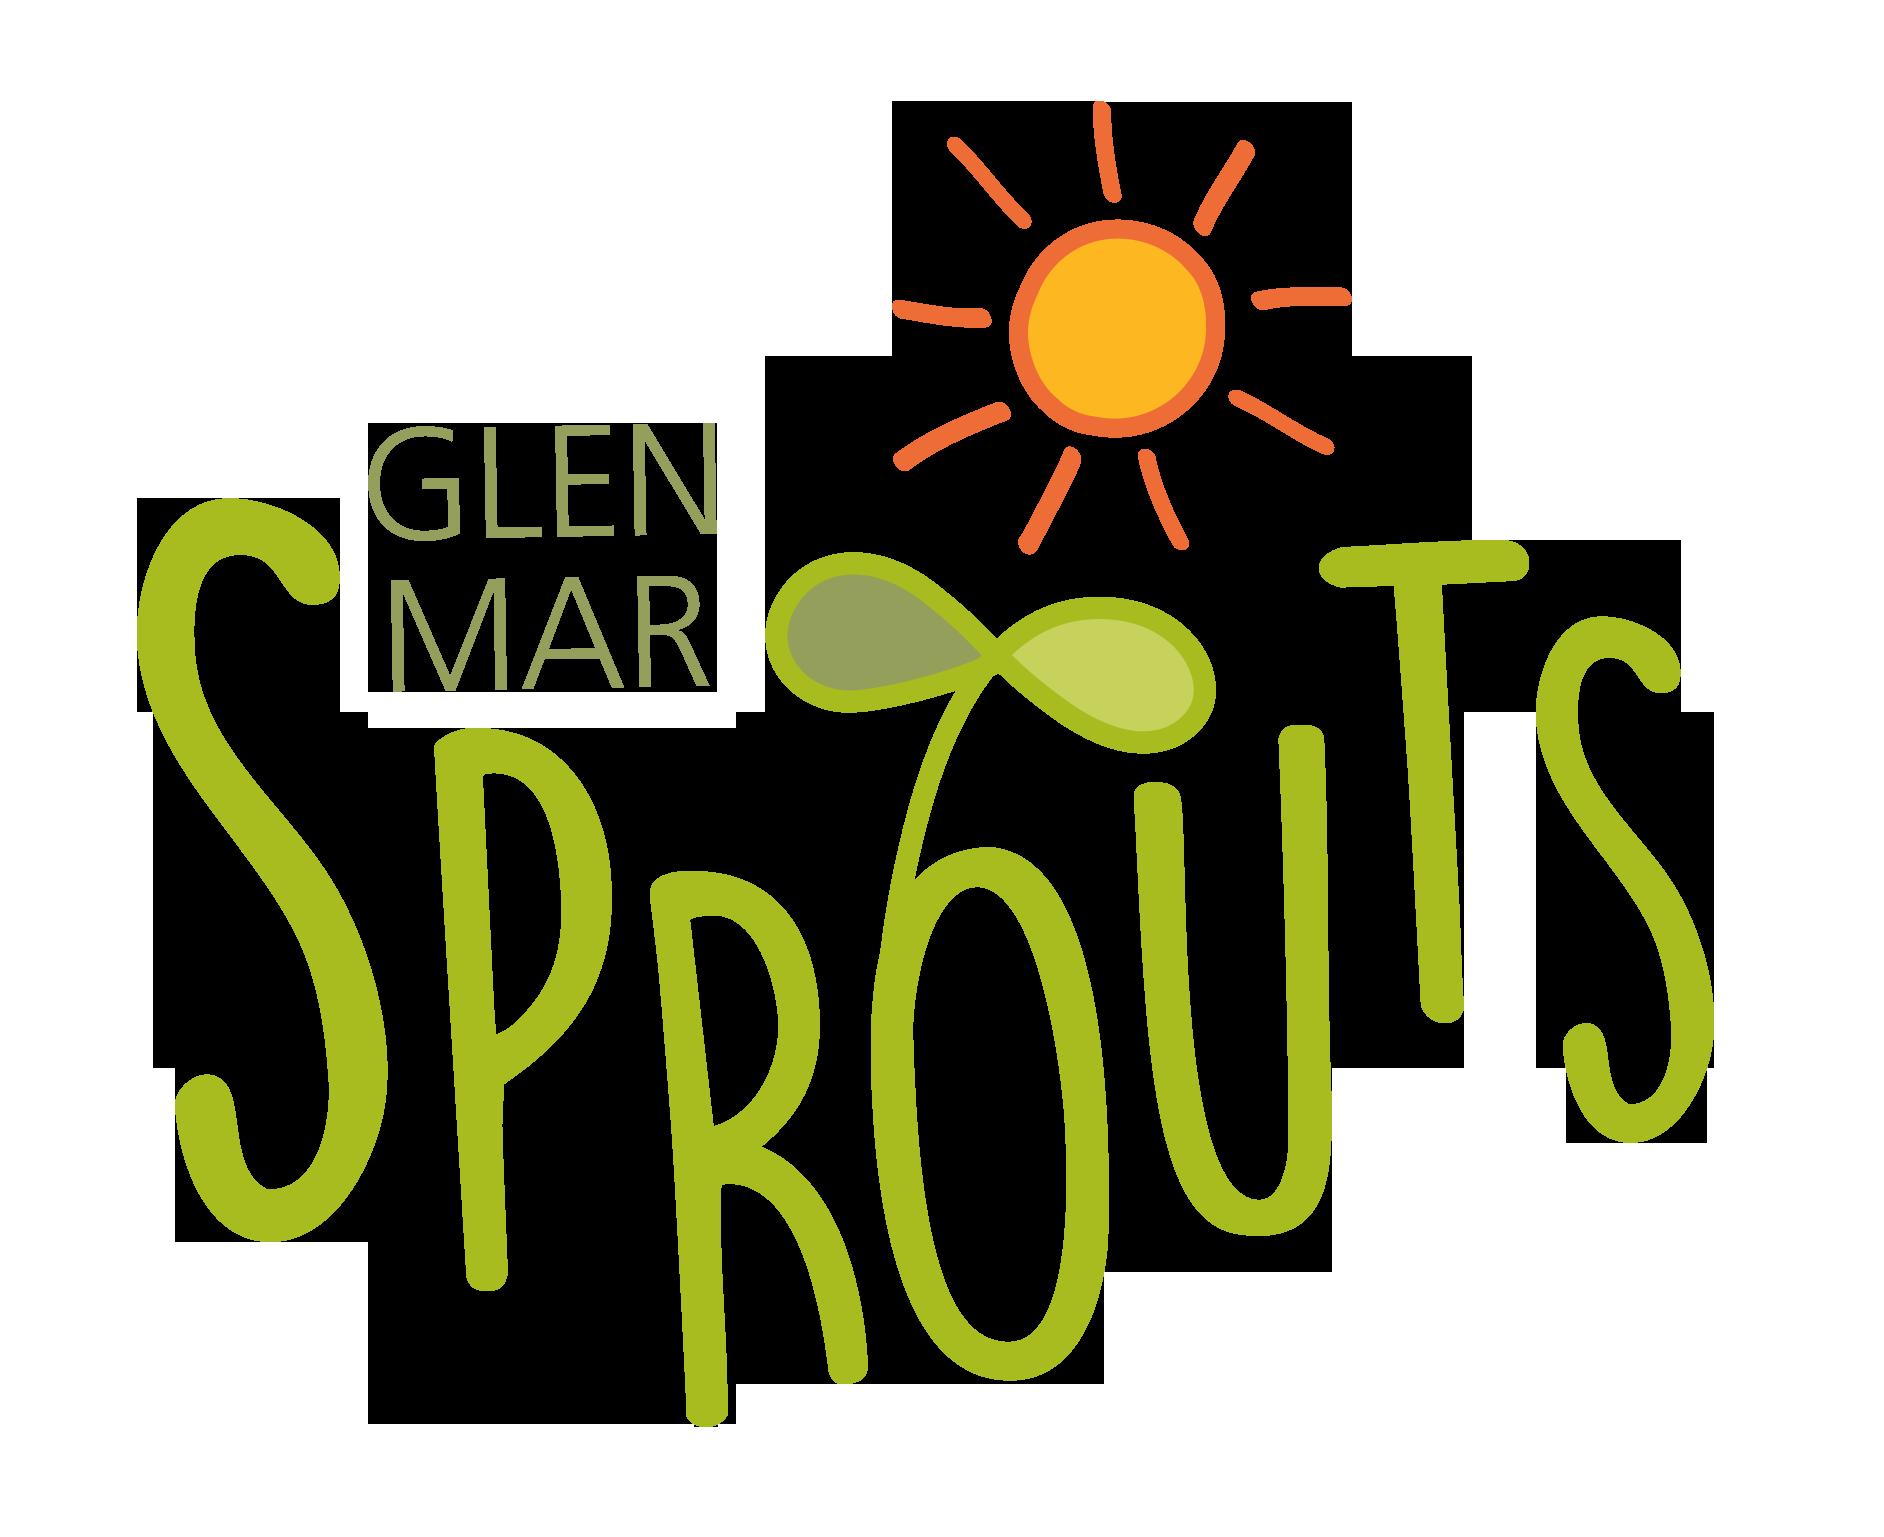 Glen Mar Sprouts Logo